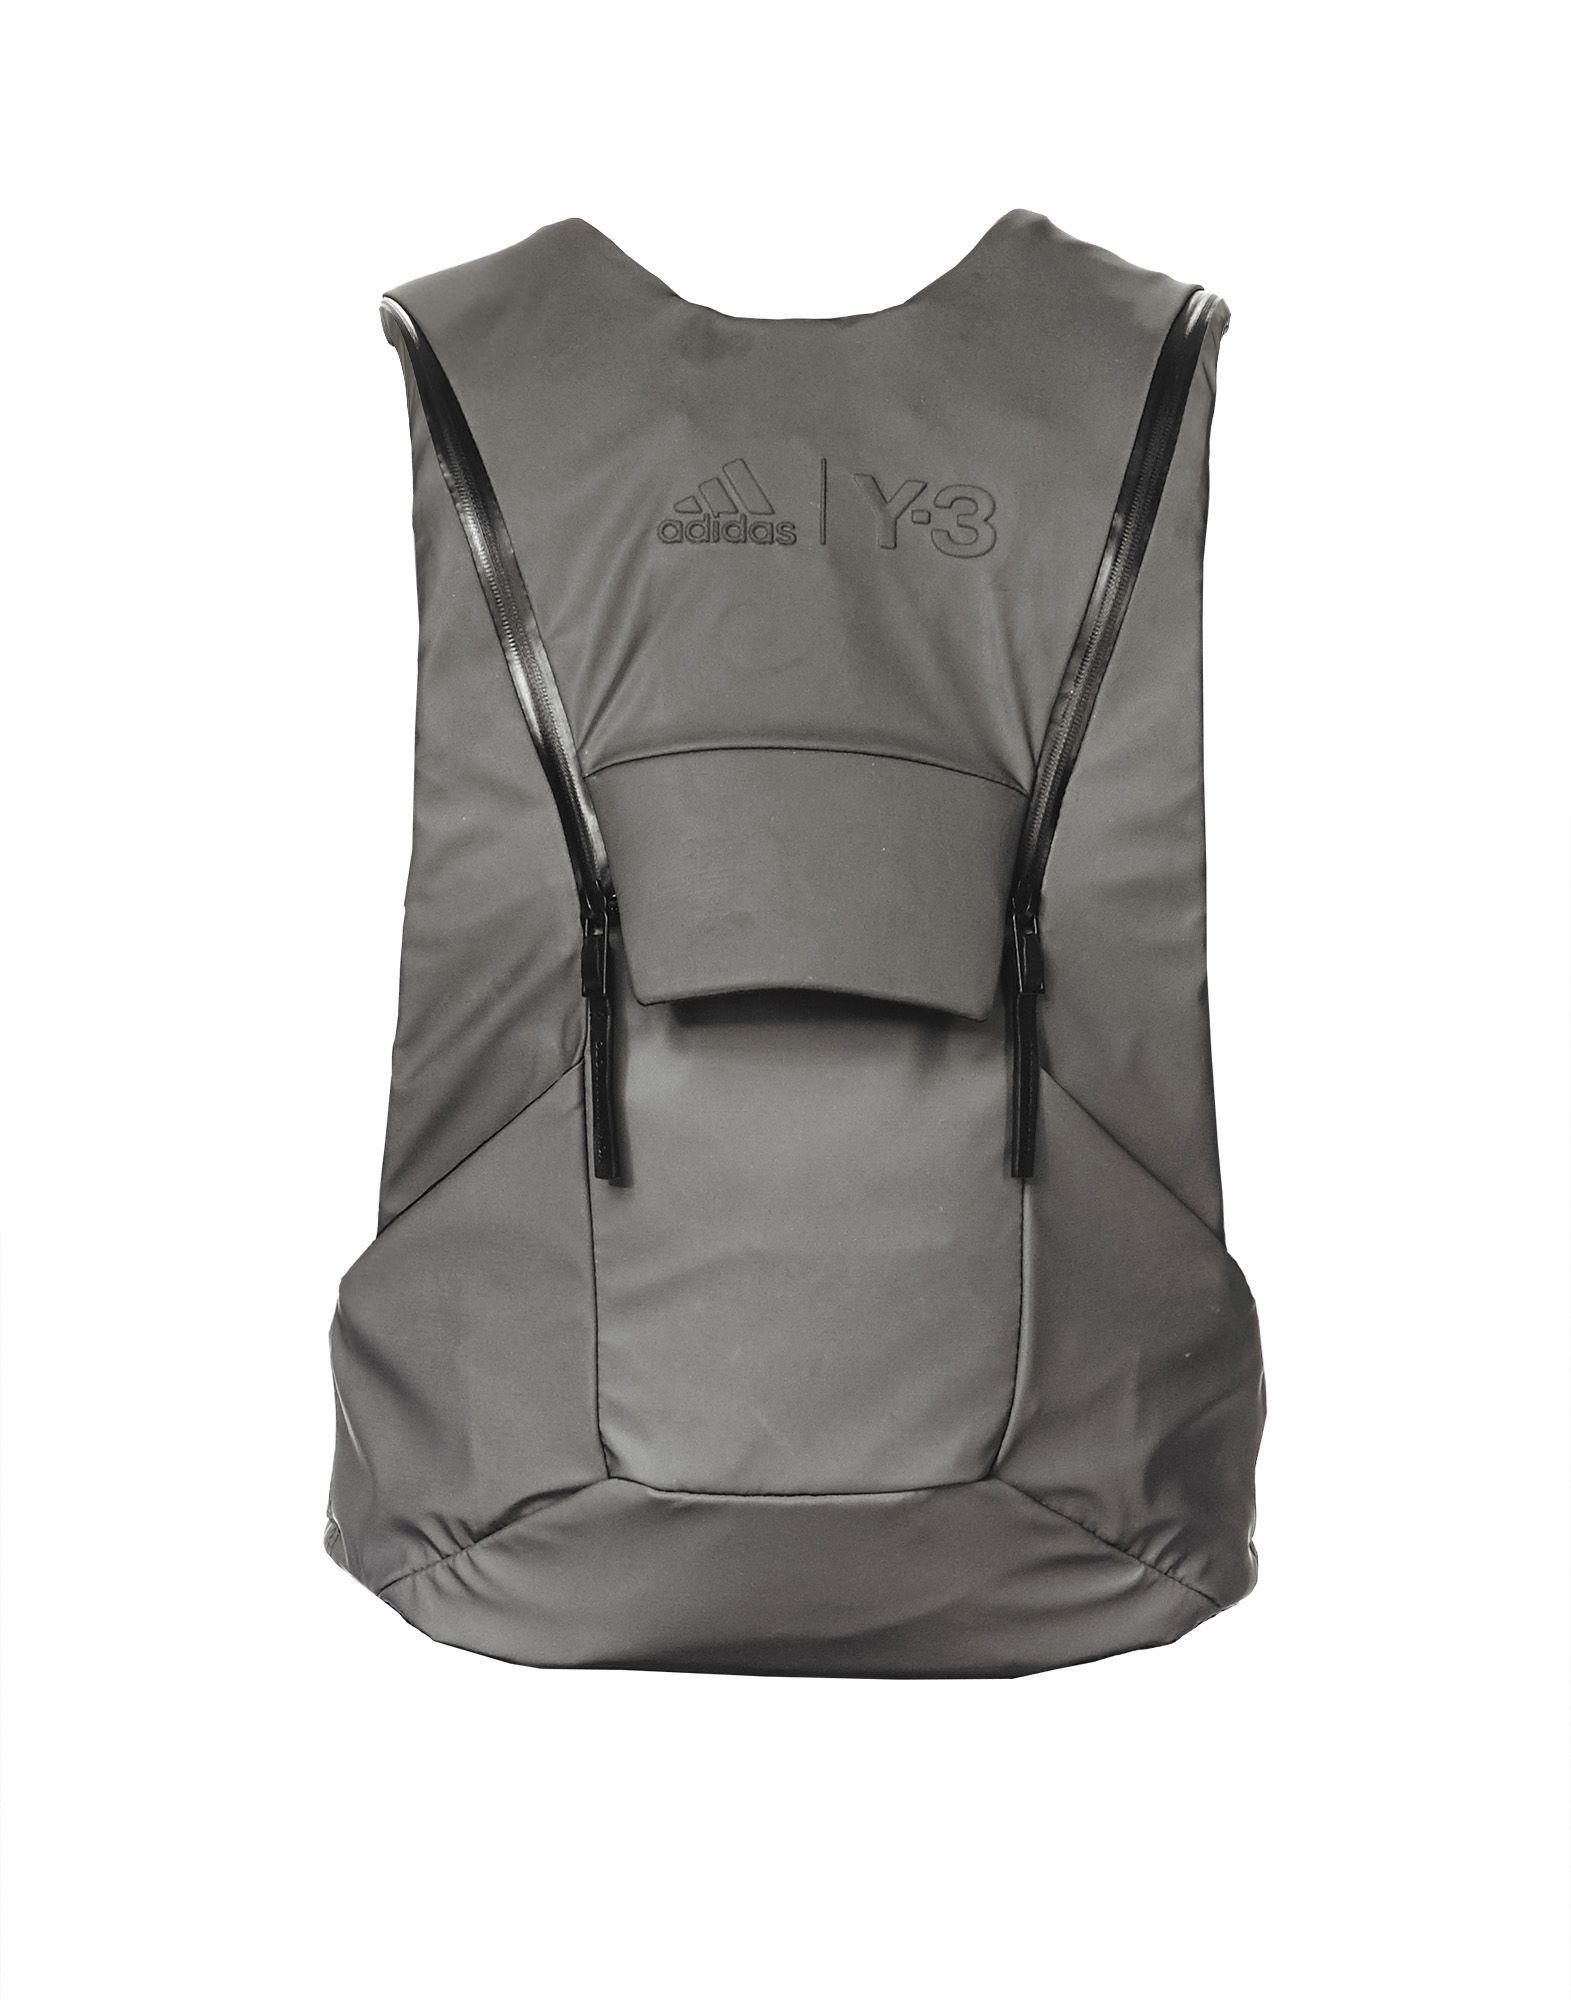 Sac AdidasProduits Unisex Homme Y Sacs Backpack 3 Sport ohrBsdtQCx